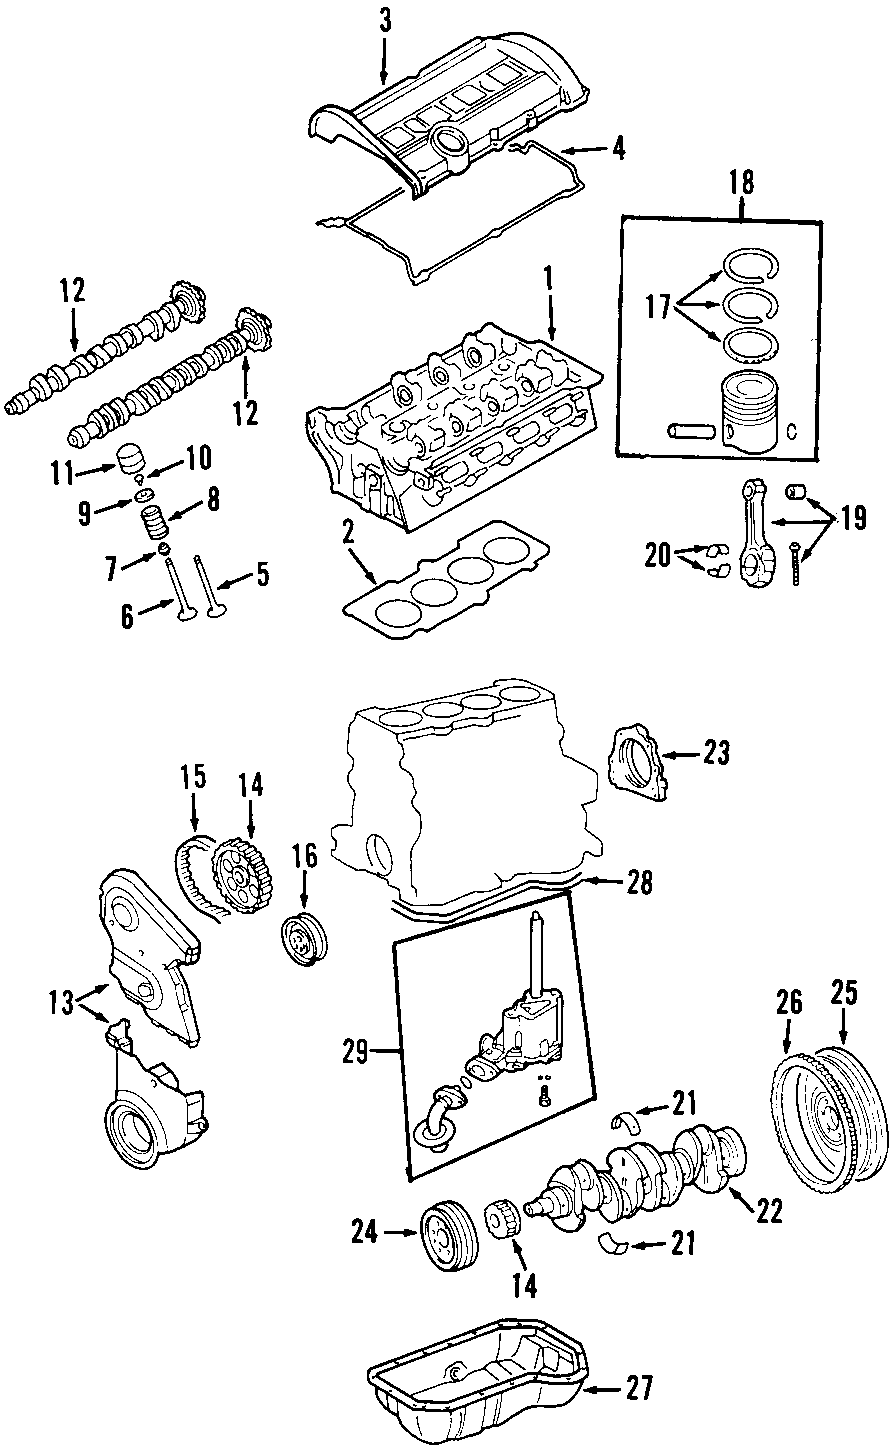 2005 Volkswagen Passat Engine Valve Stem Oil Seal. Audi